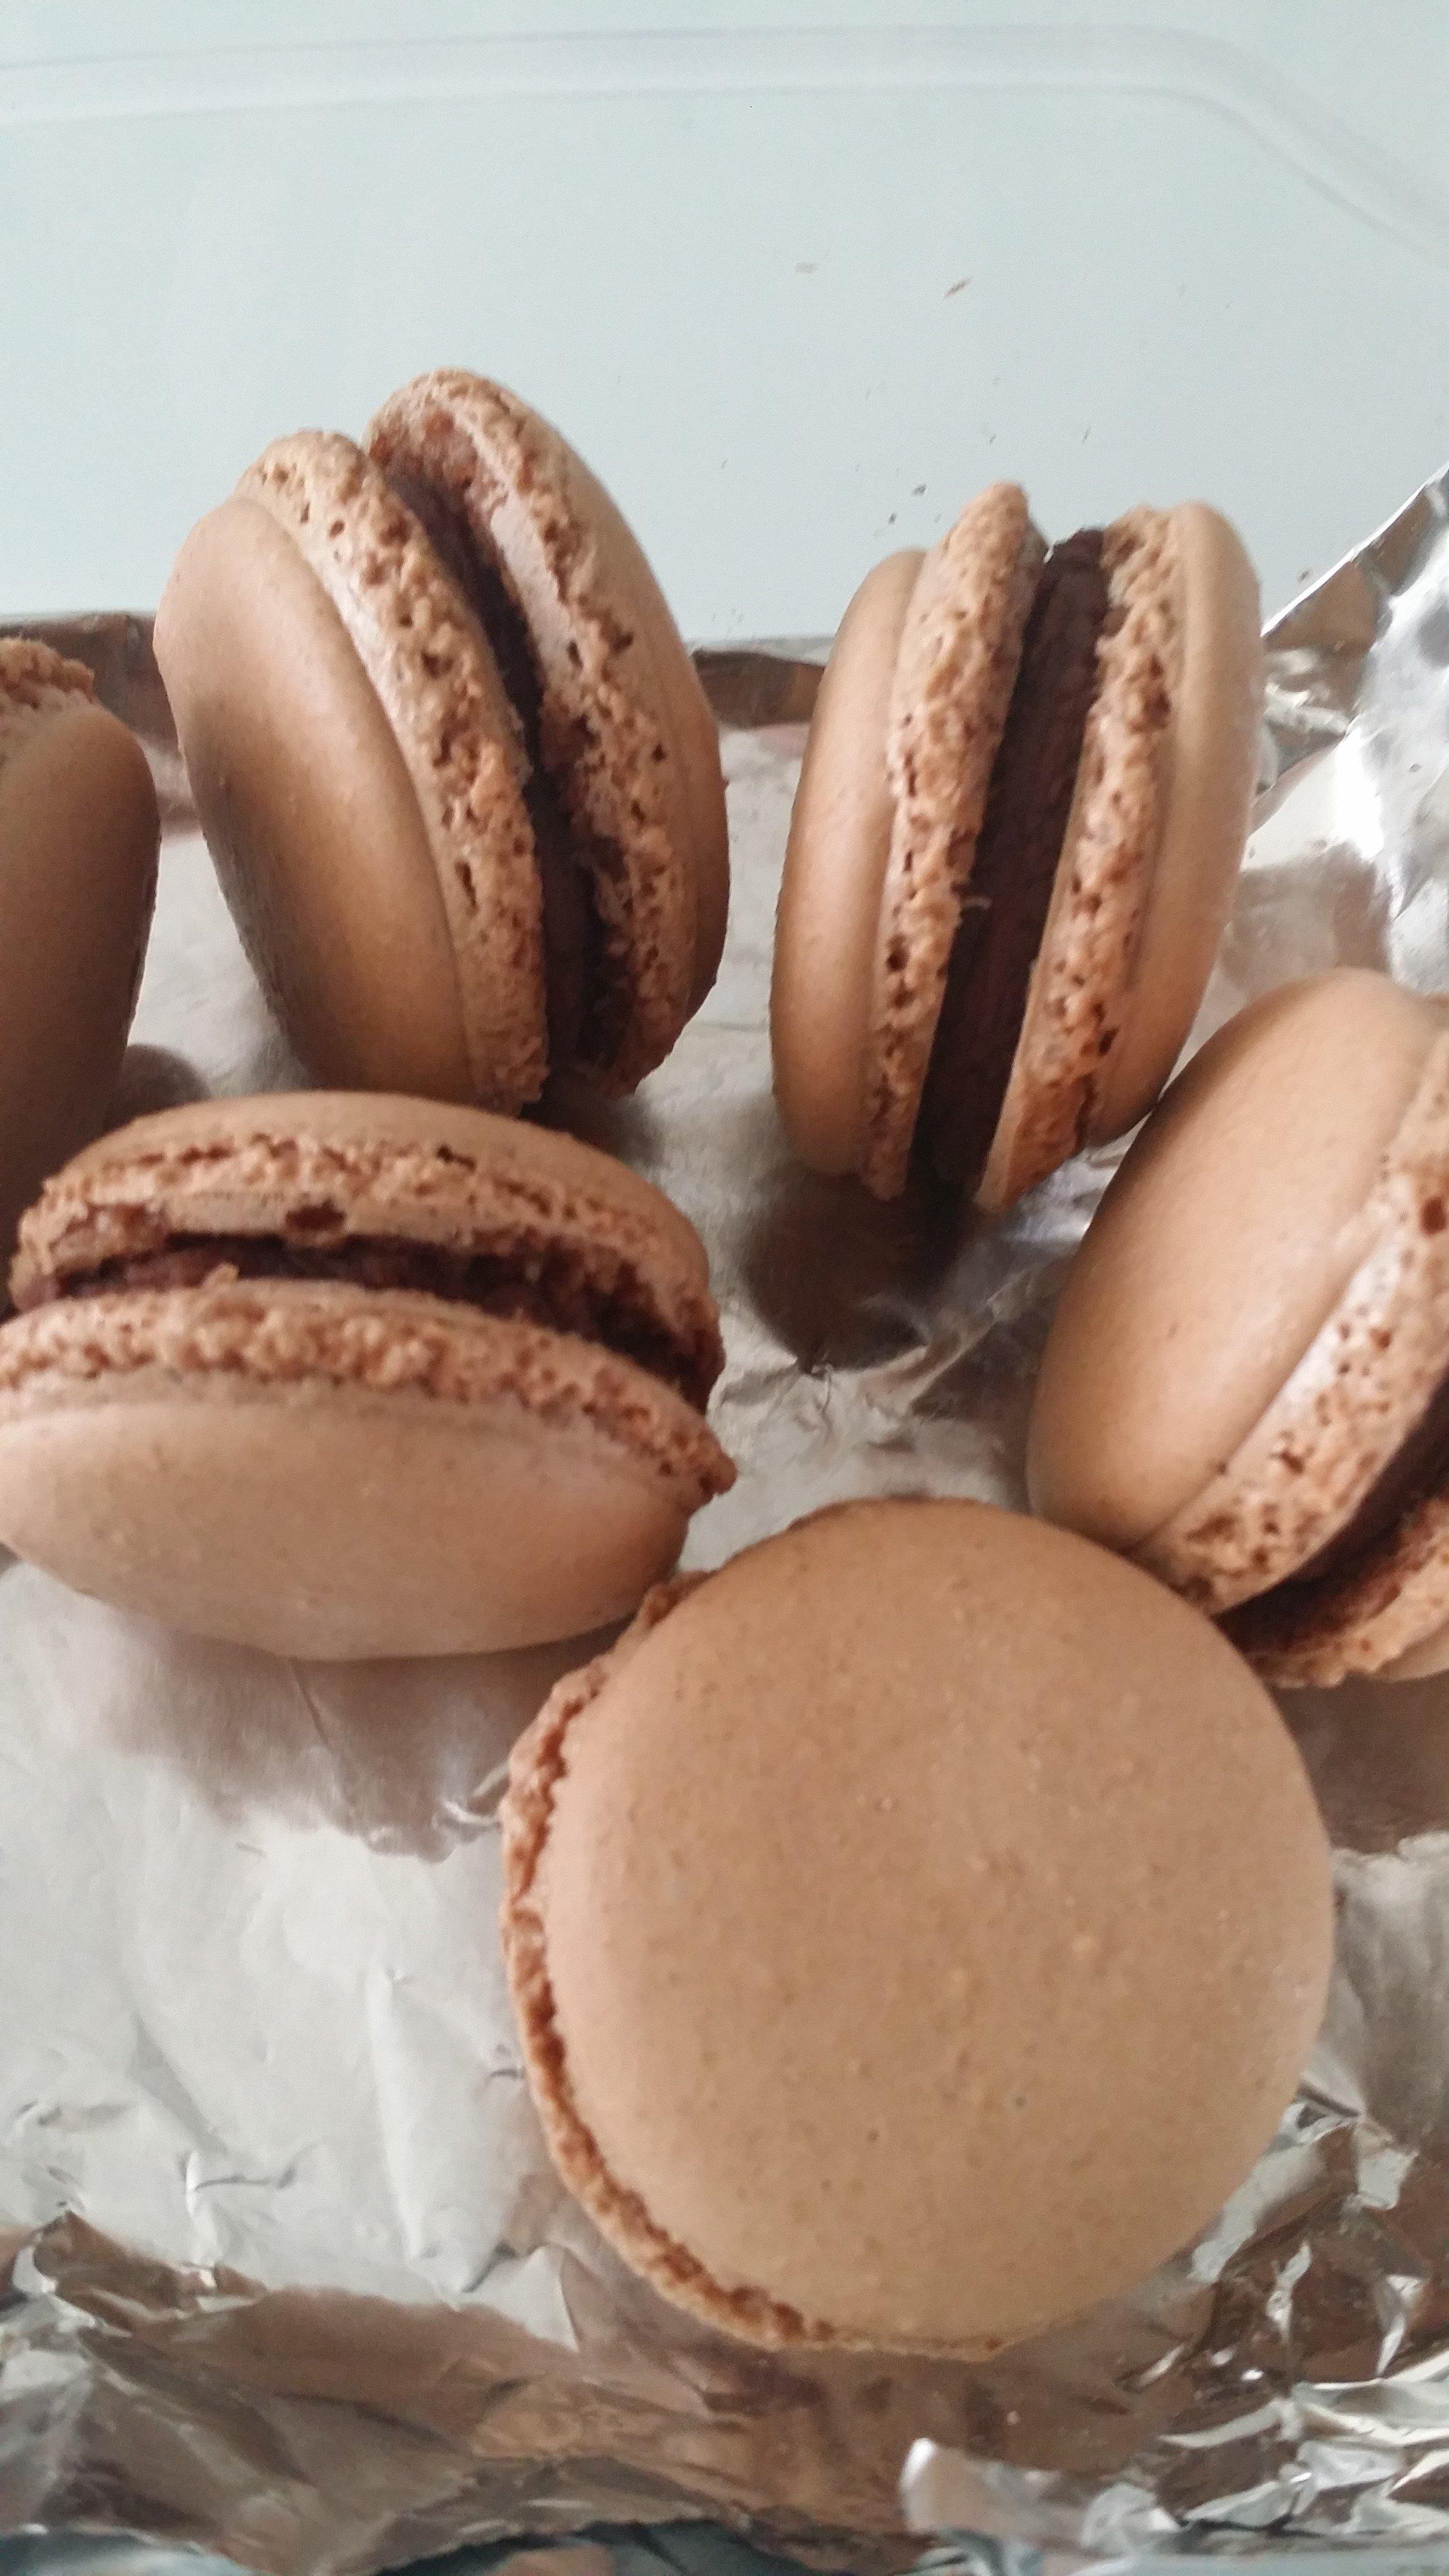 Macaron totalement chocolat